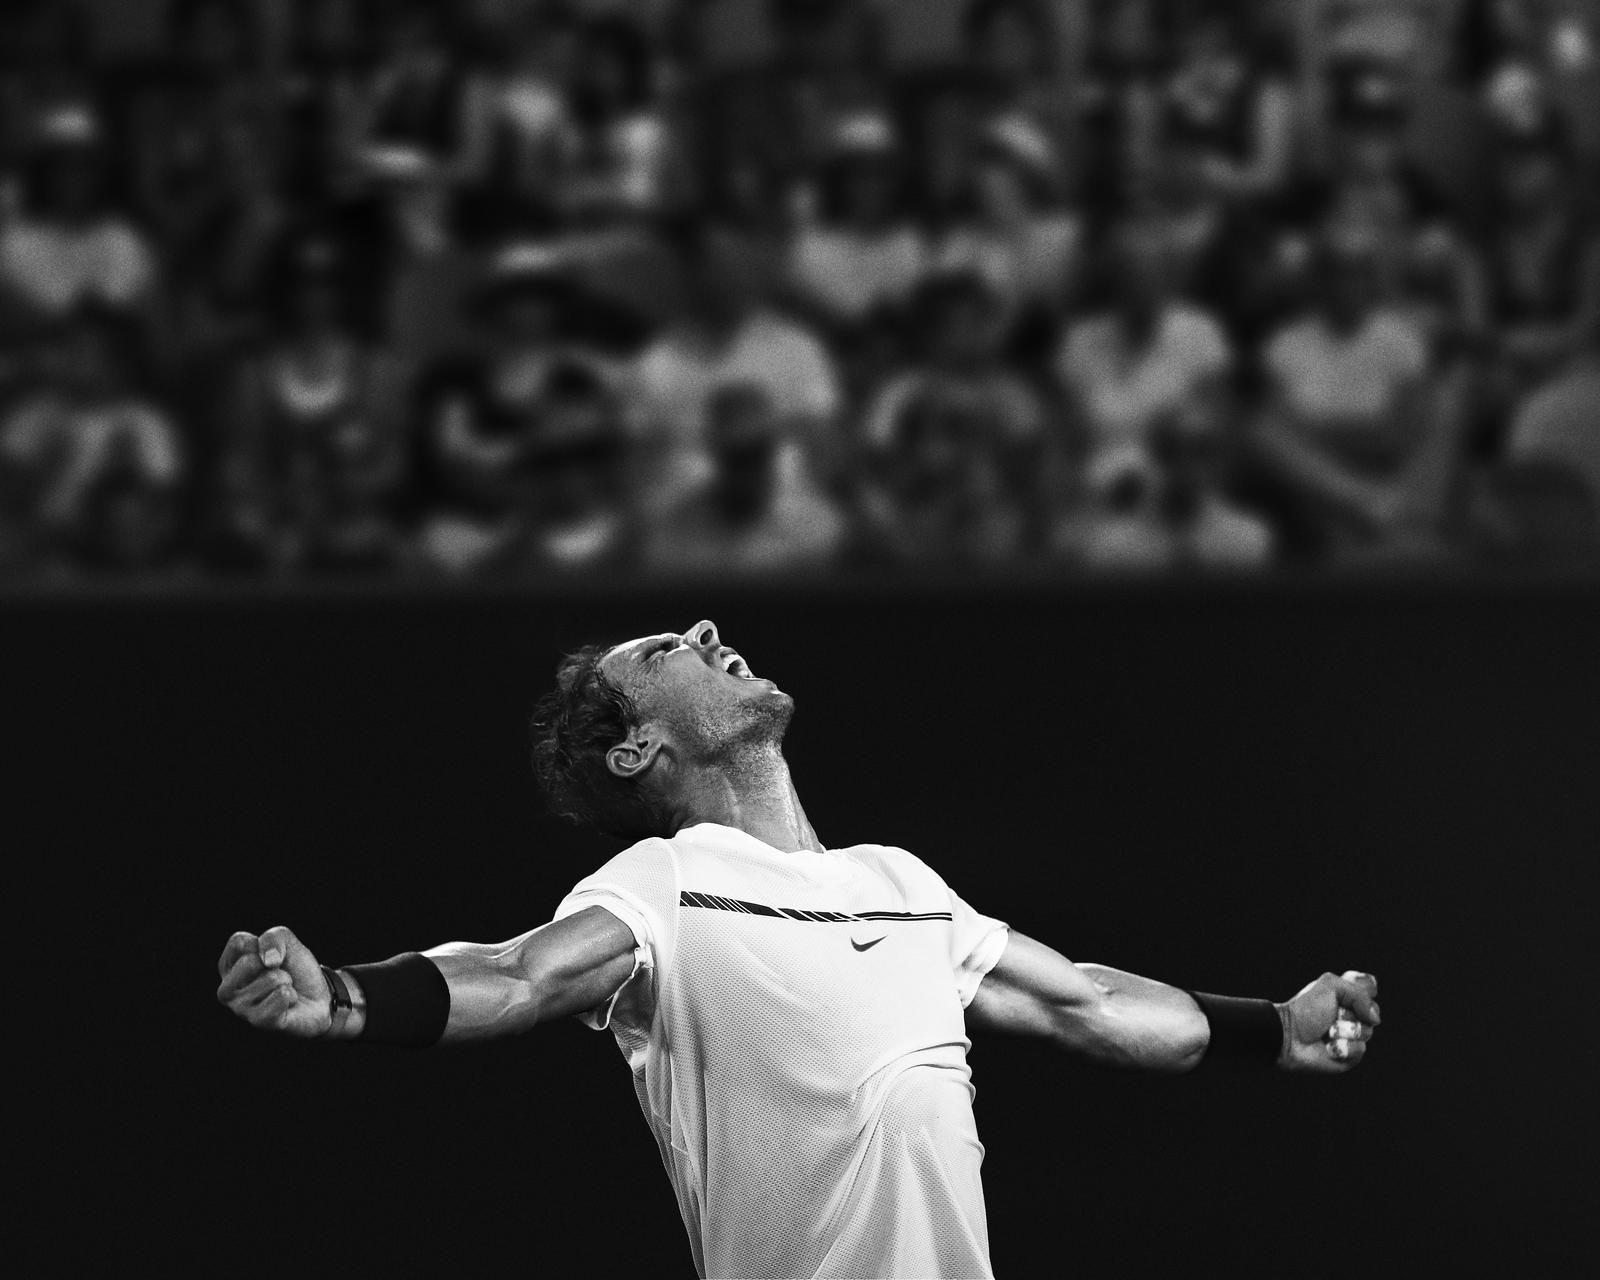 ballena Arreglo función  Rafael Nadal Claims Third Title in New York | Rafael nadal, Nike campaign,  Just do it